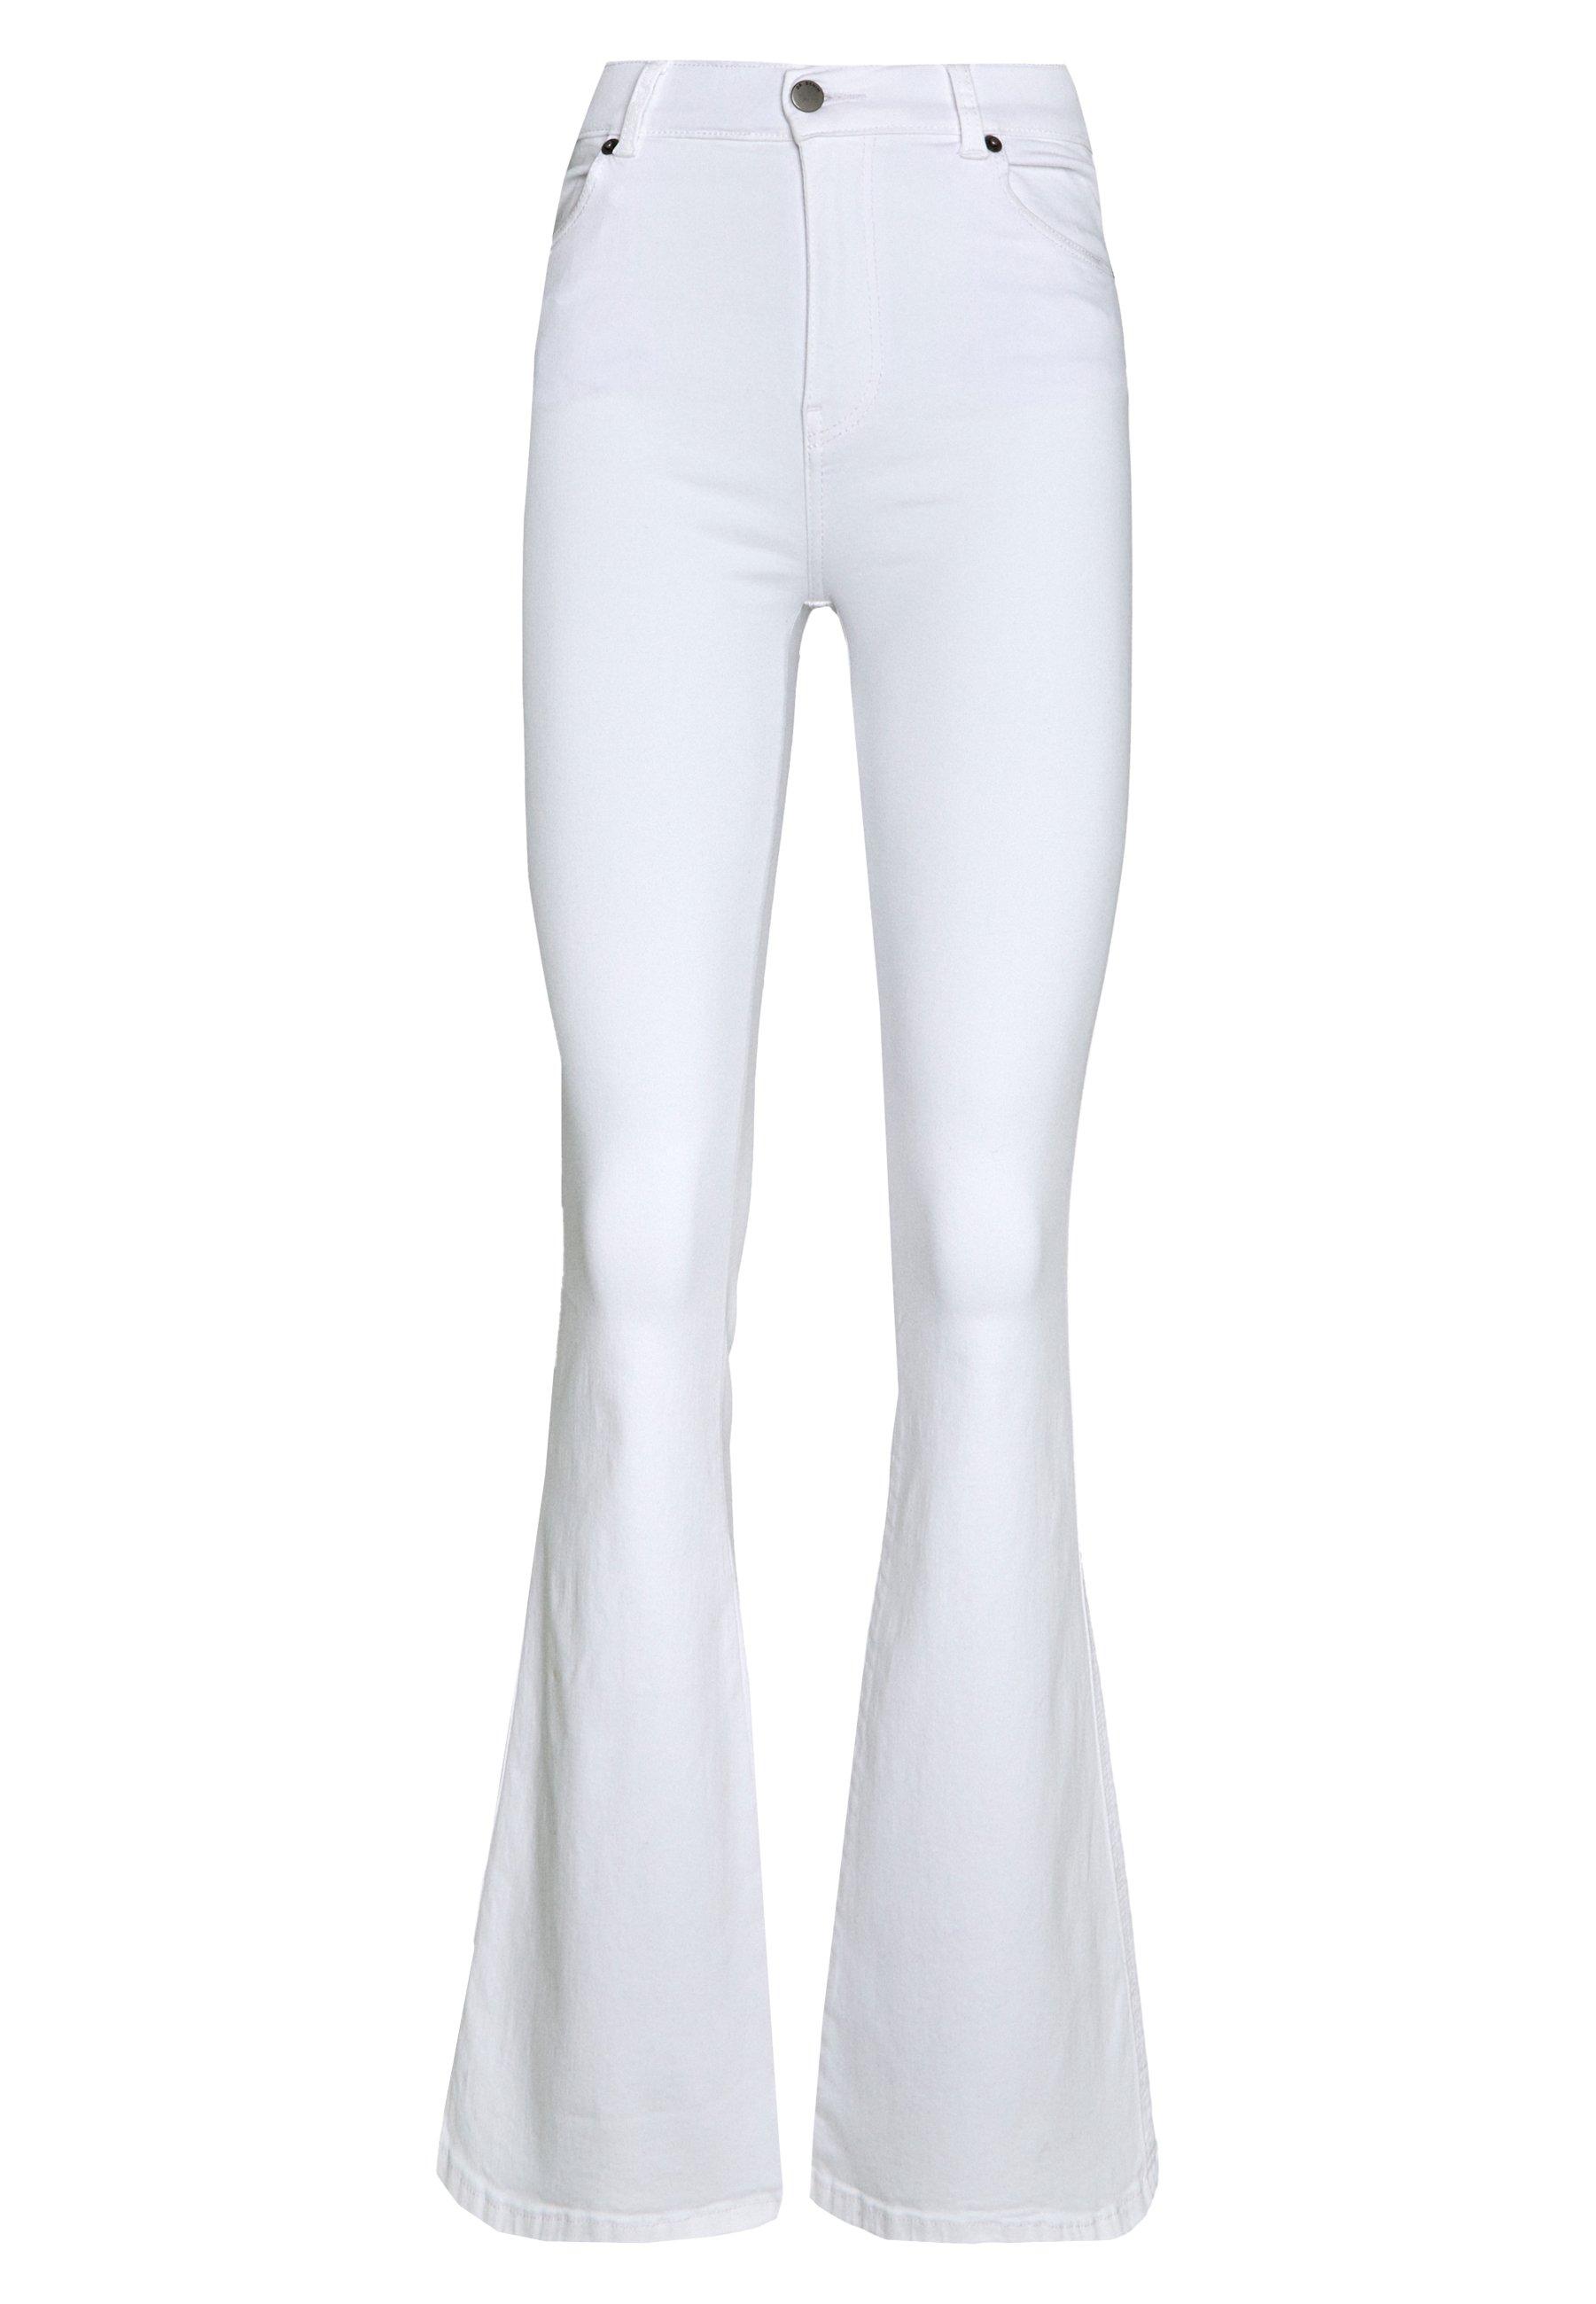 Dr.denim Soniq - Jeans Bootcut Westcoast Blue